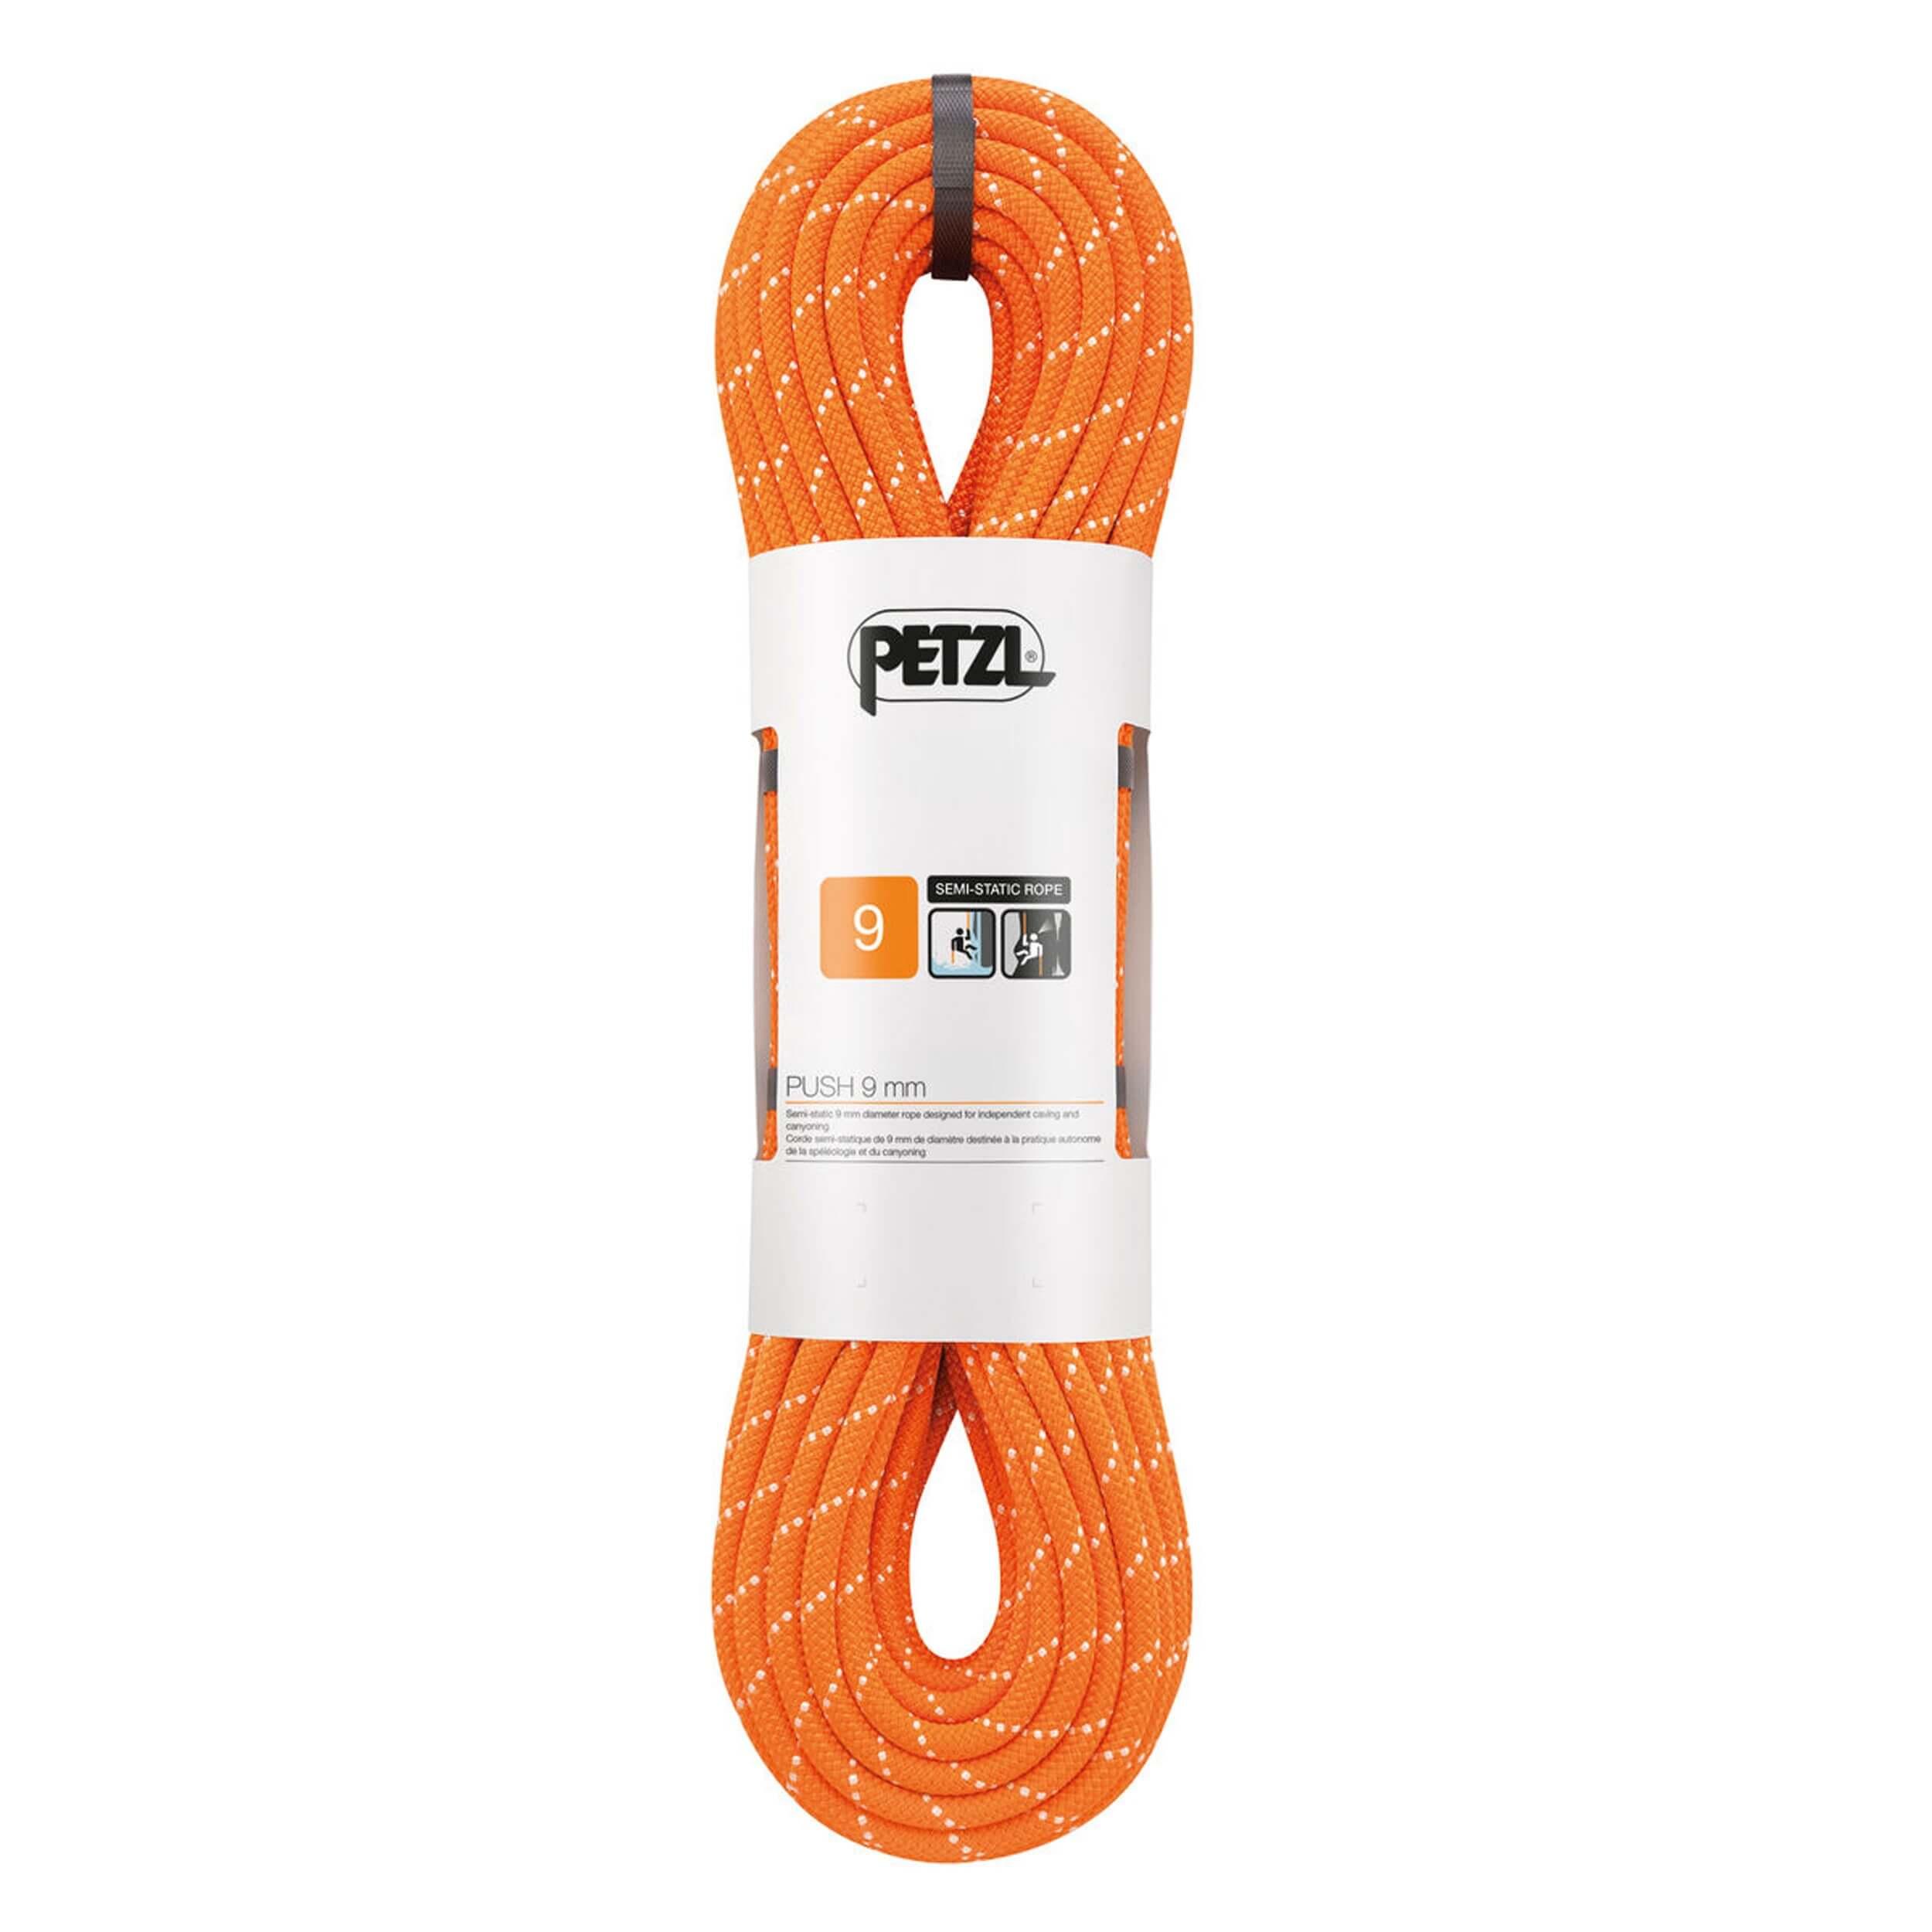 Petzl PUSH 9 mm Seil